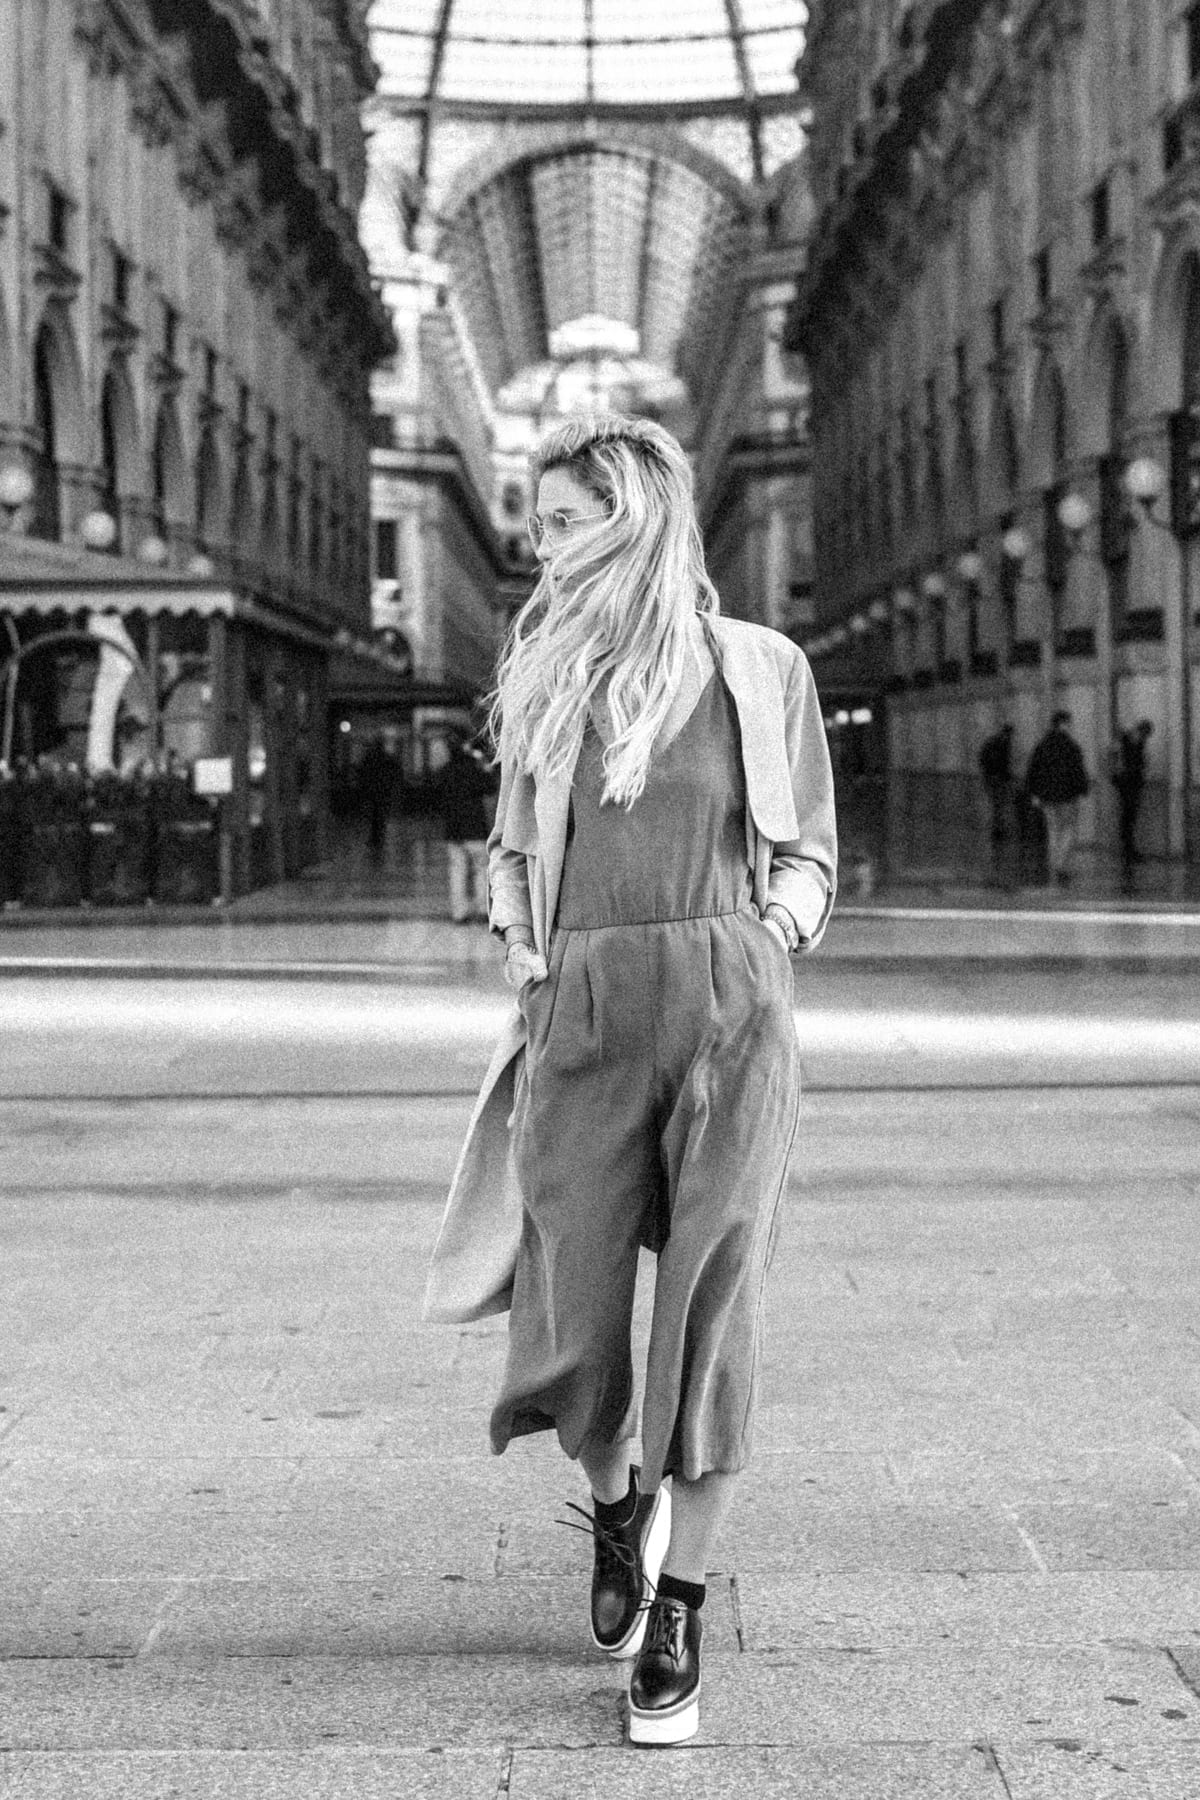 CK_1604_Constantly-K-milano-street-style-fashion-eataly-3951